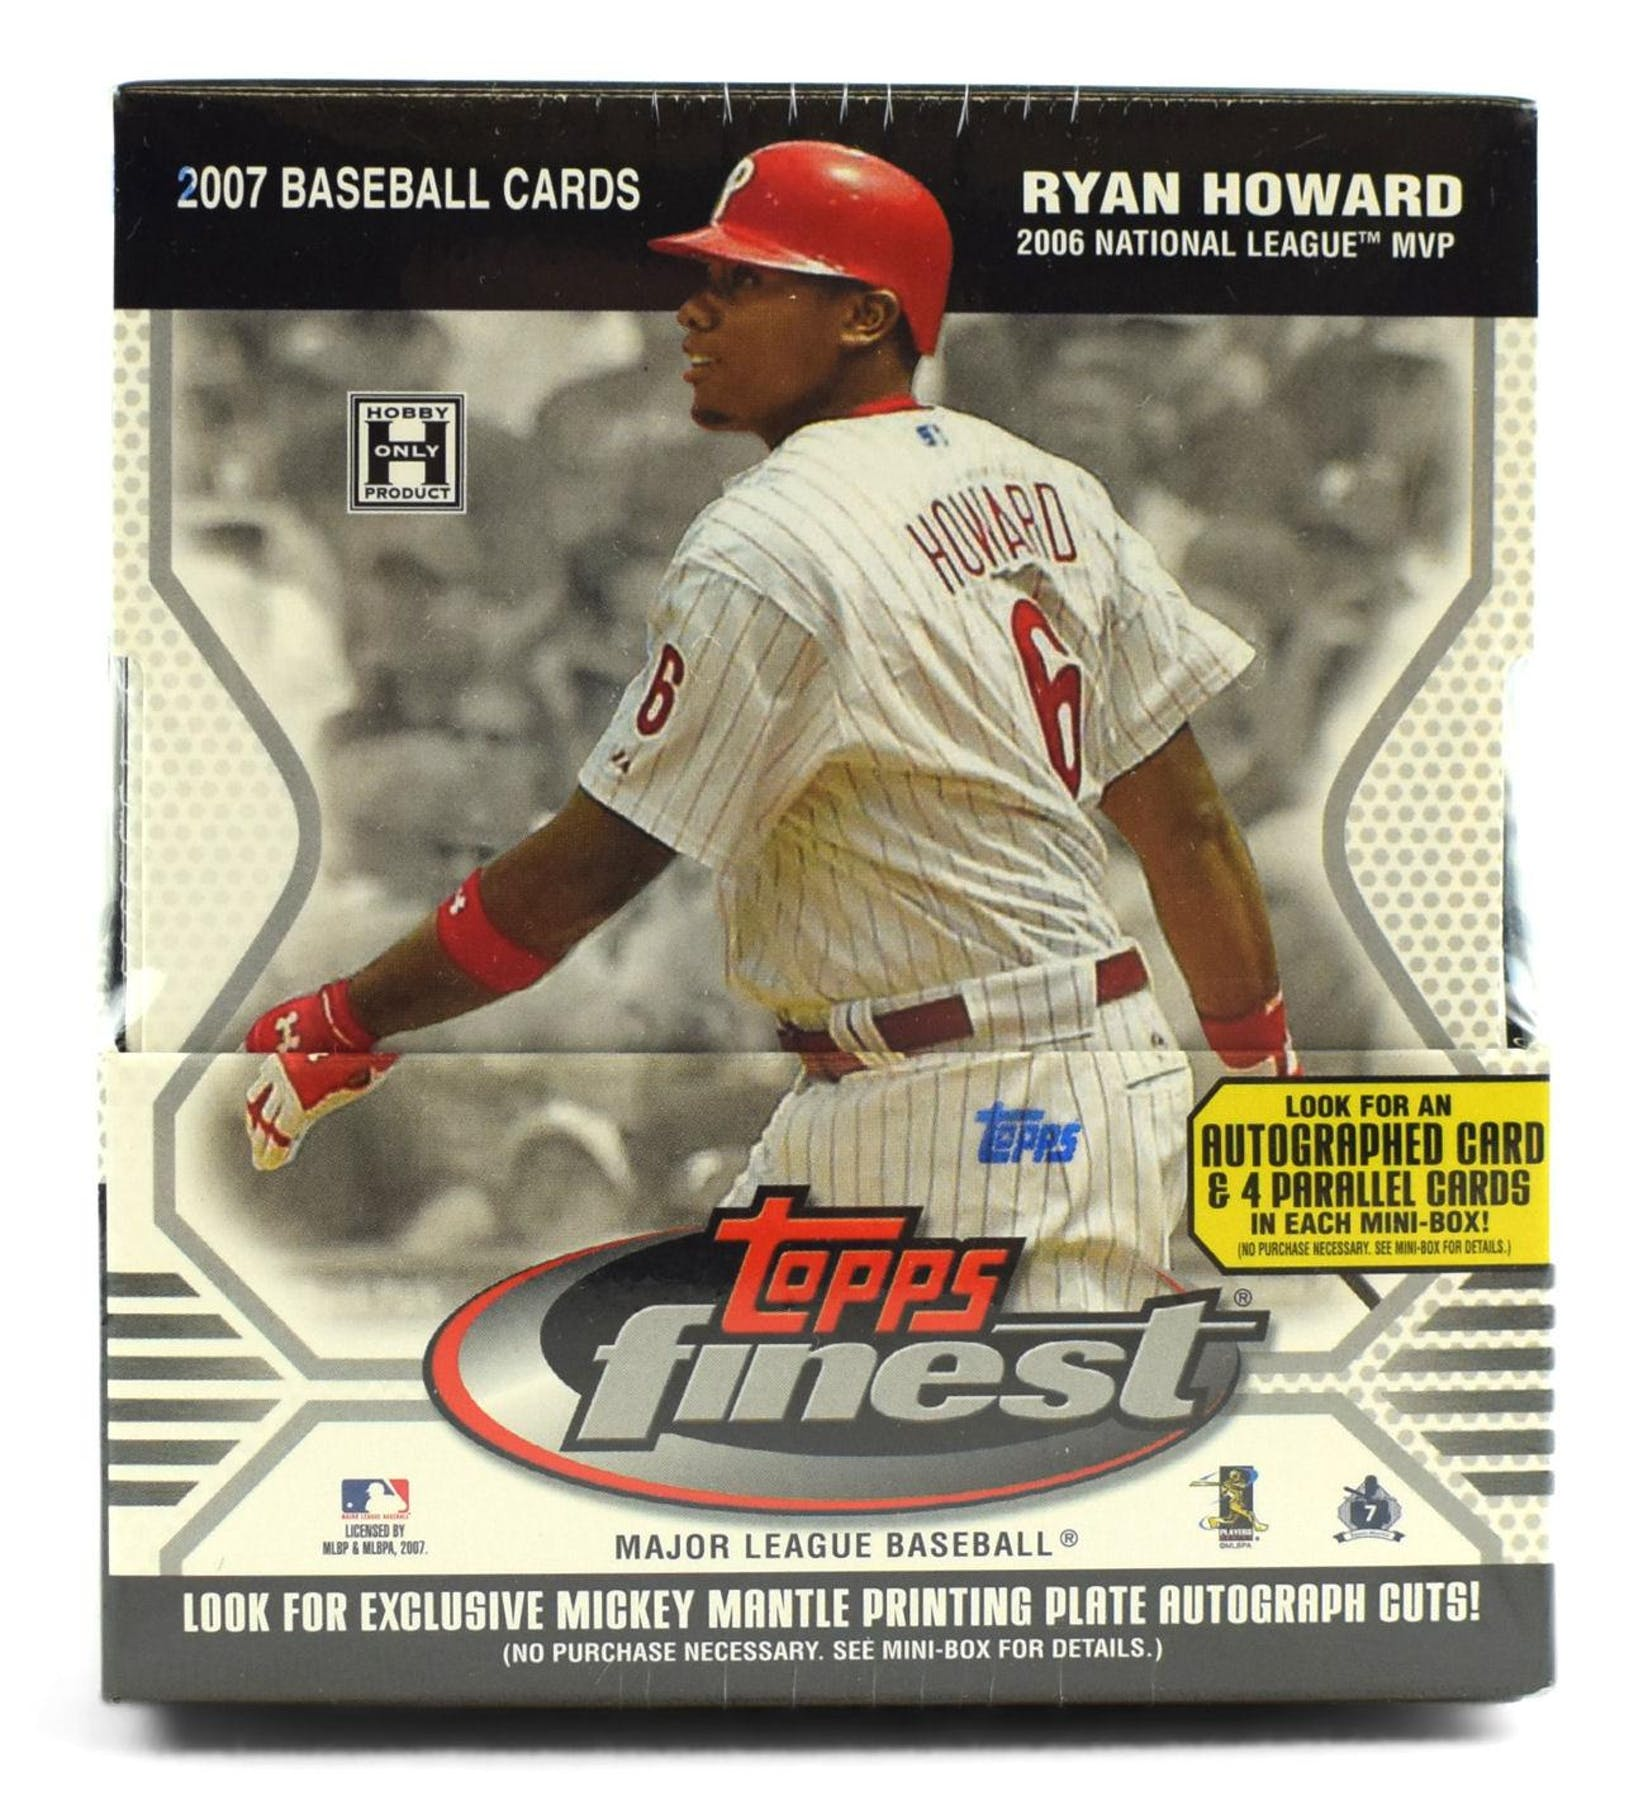 2007 Topps Finest Baseball Hobby Box Da Card World